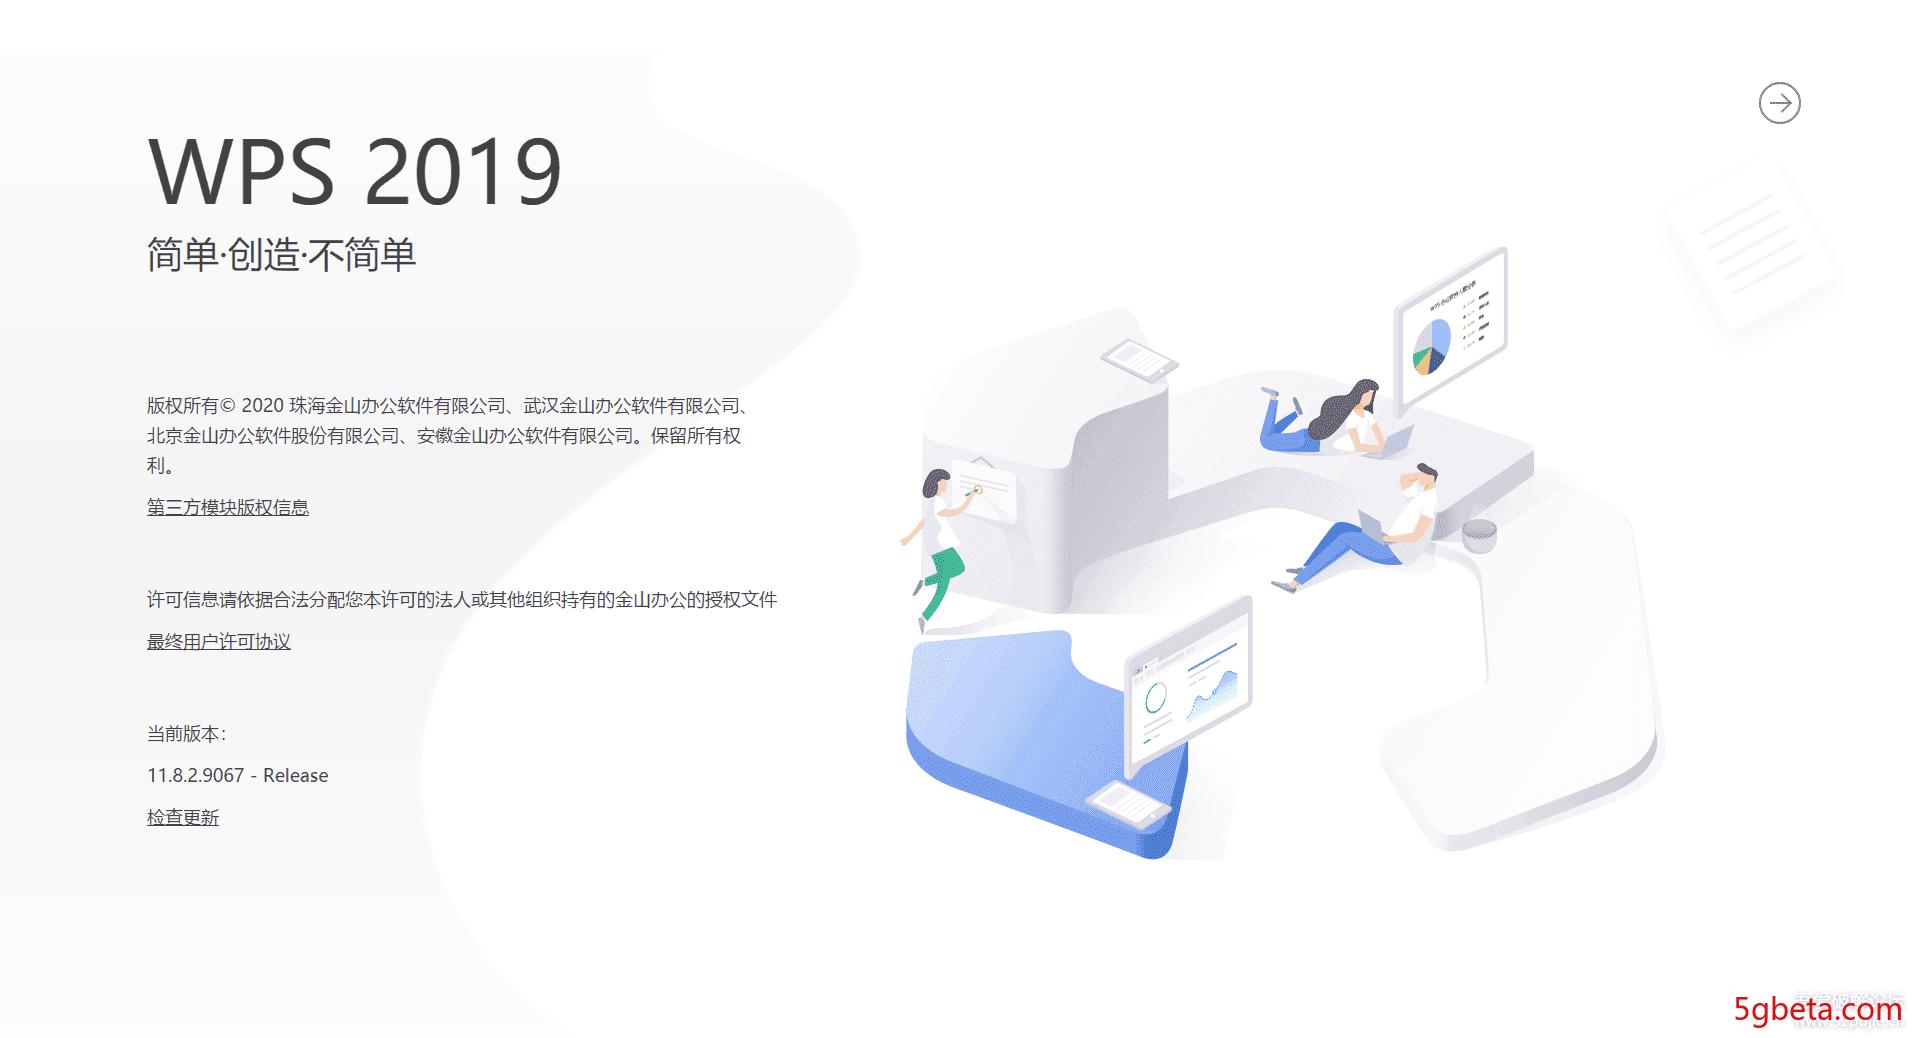 WPS Office 2019 专业版 2020.10.30 官方最新签发版